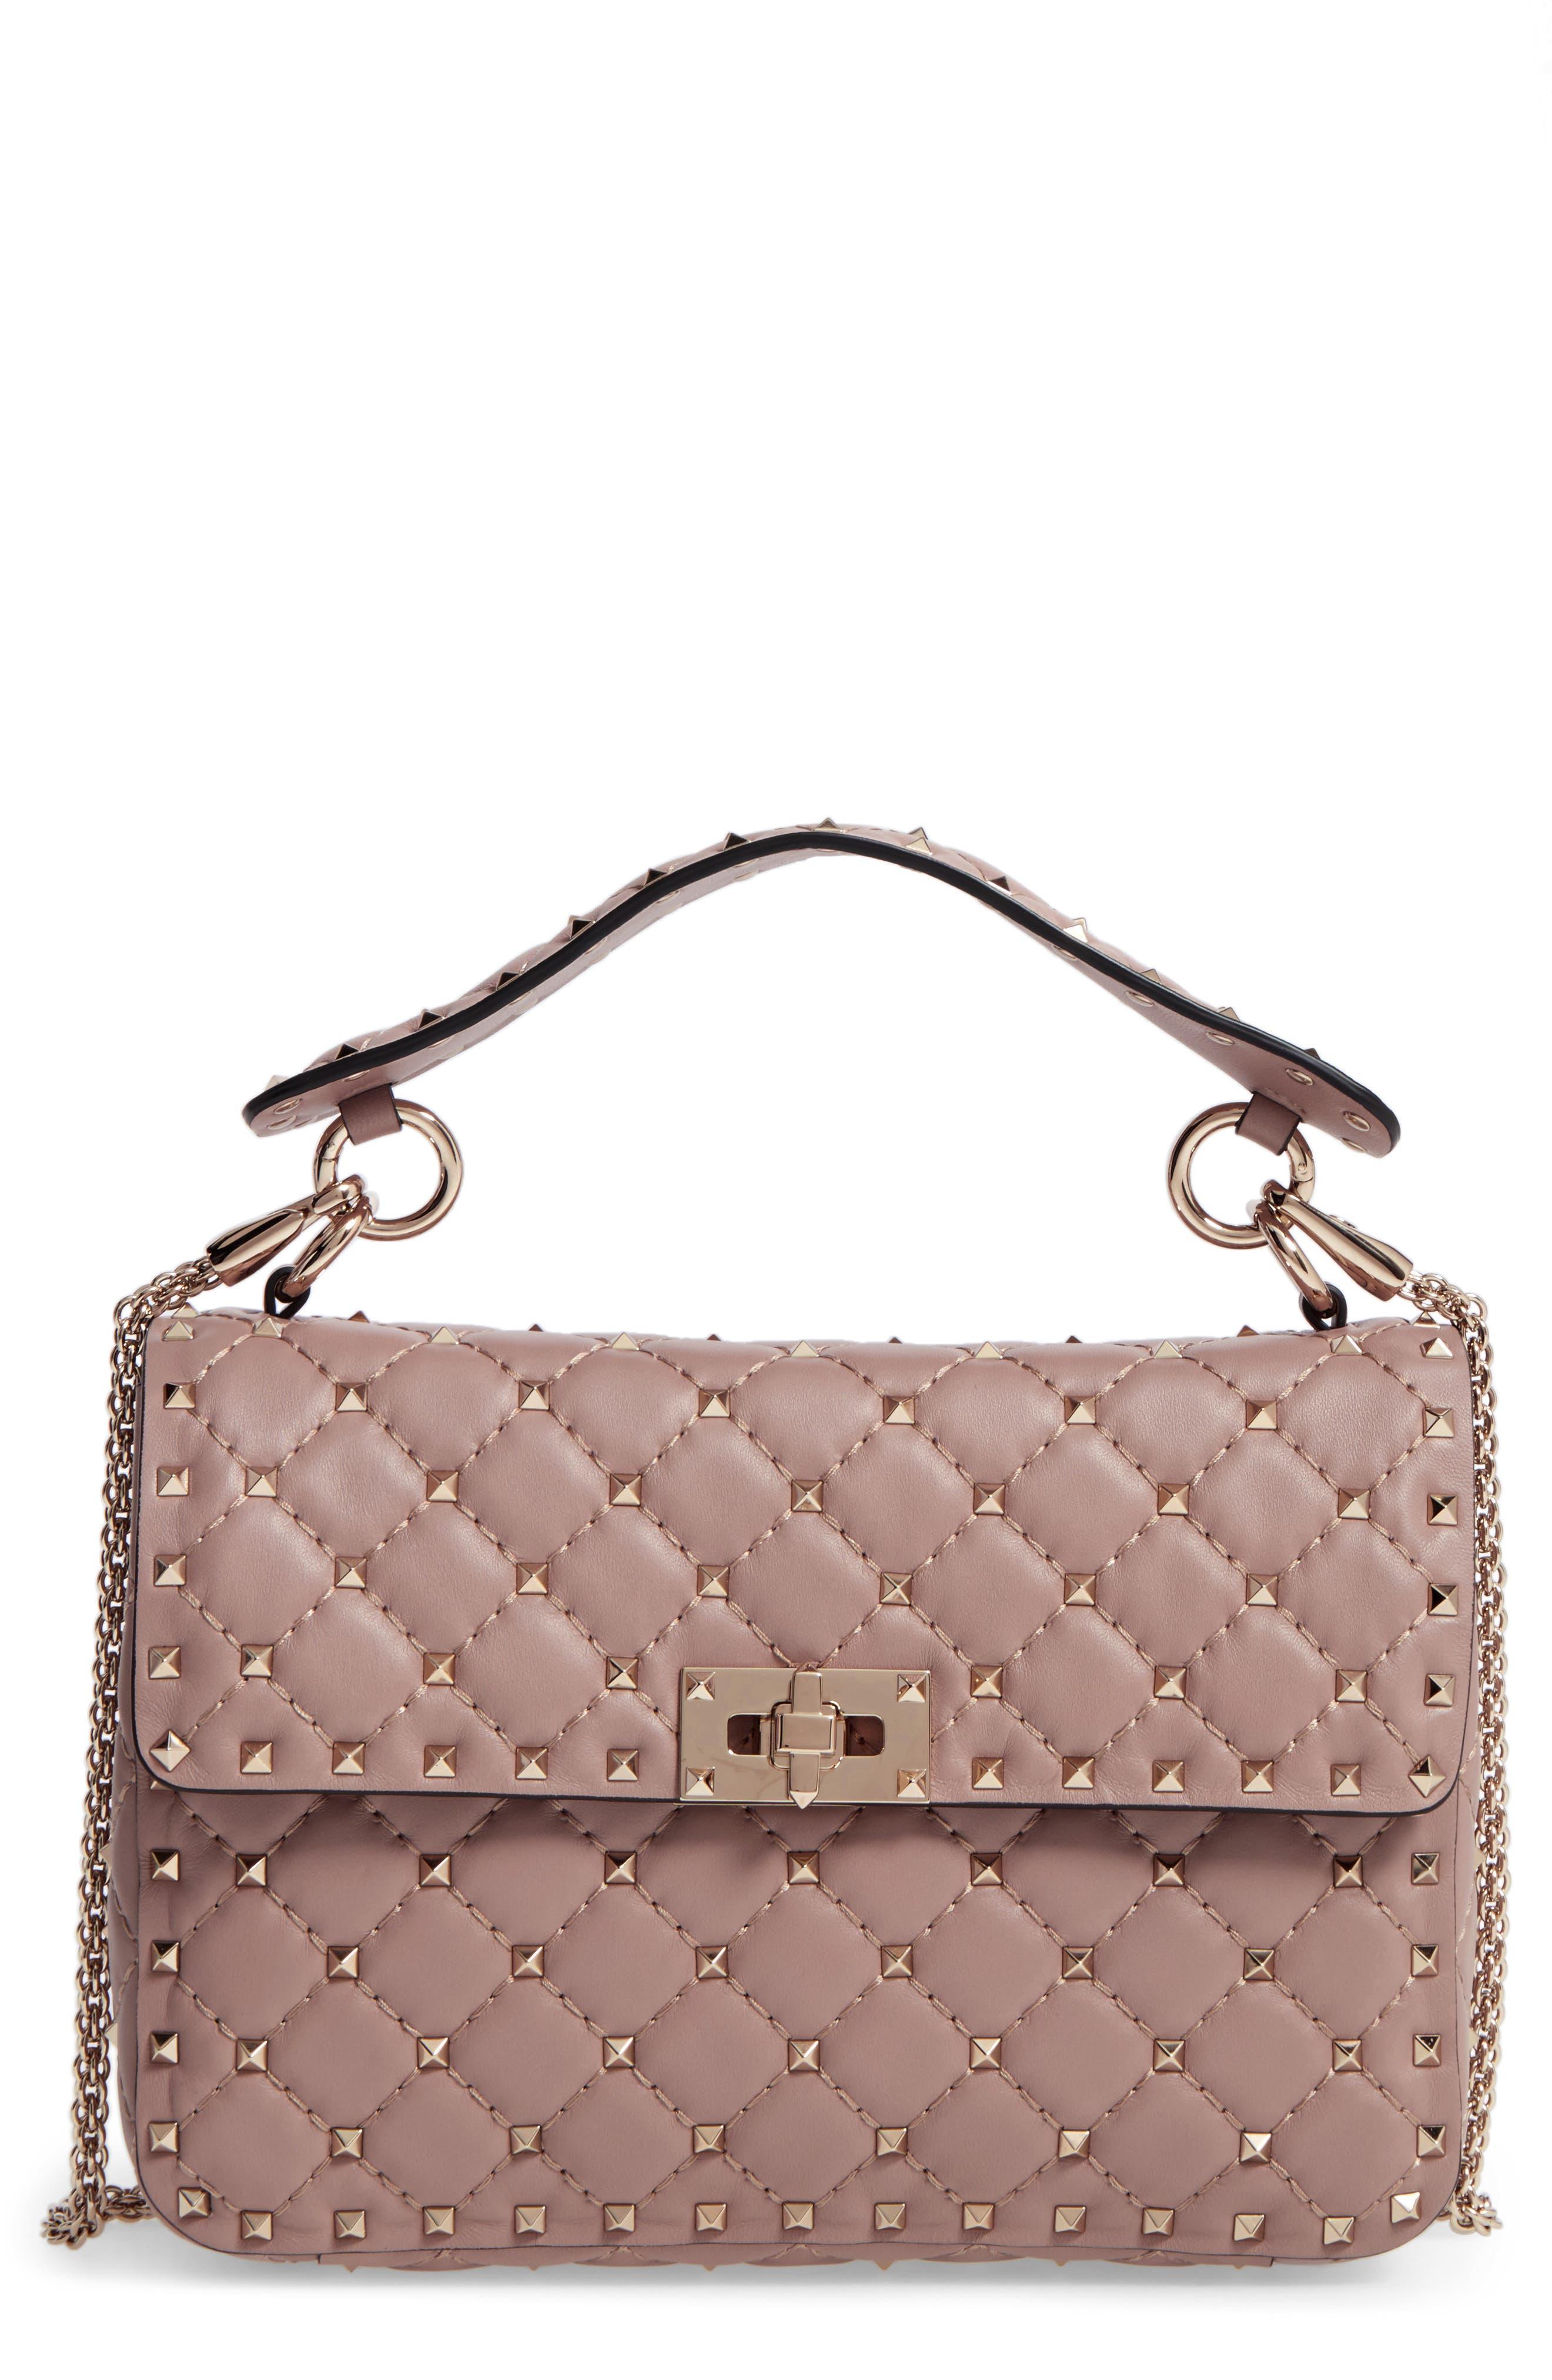 Alternate Image 1 Selected - Valentino Medium Rockstud Spike Crossbody Bag